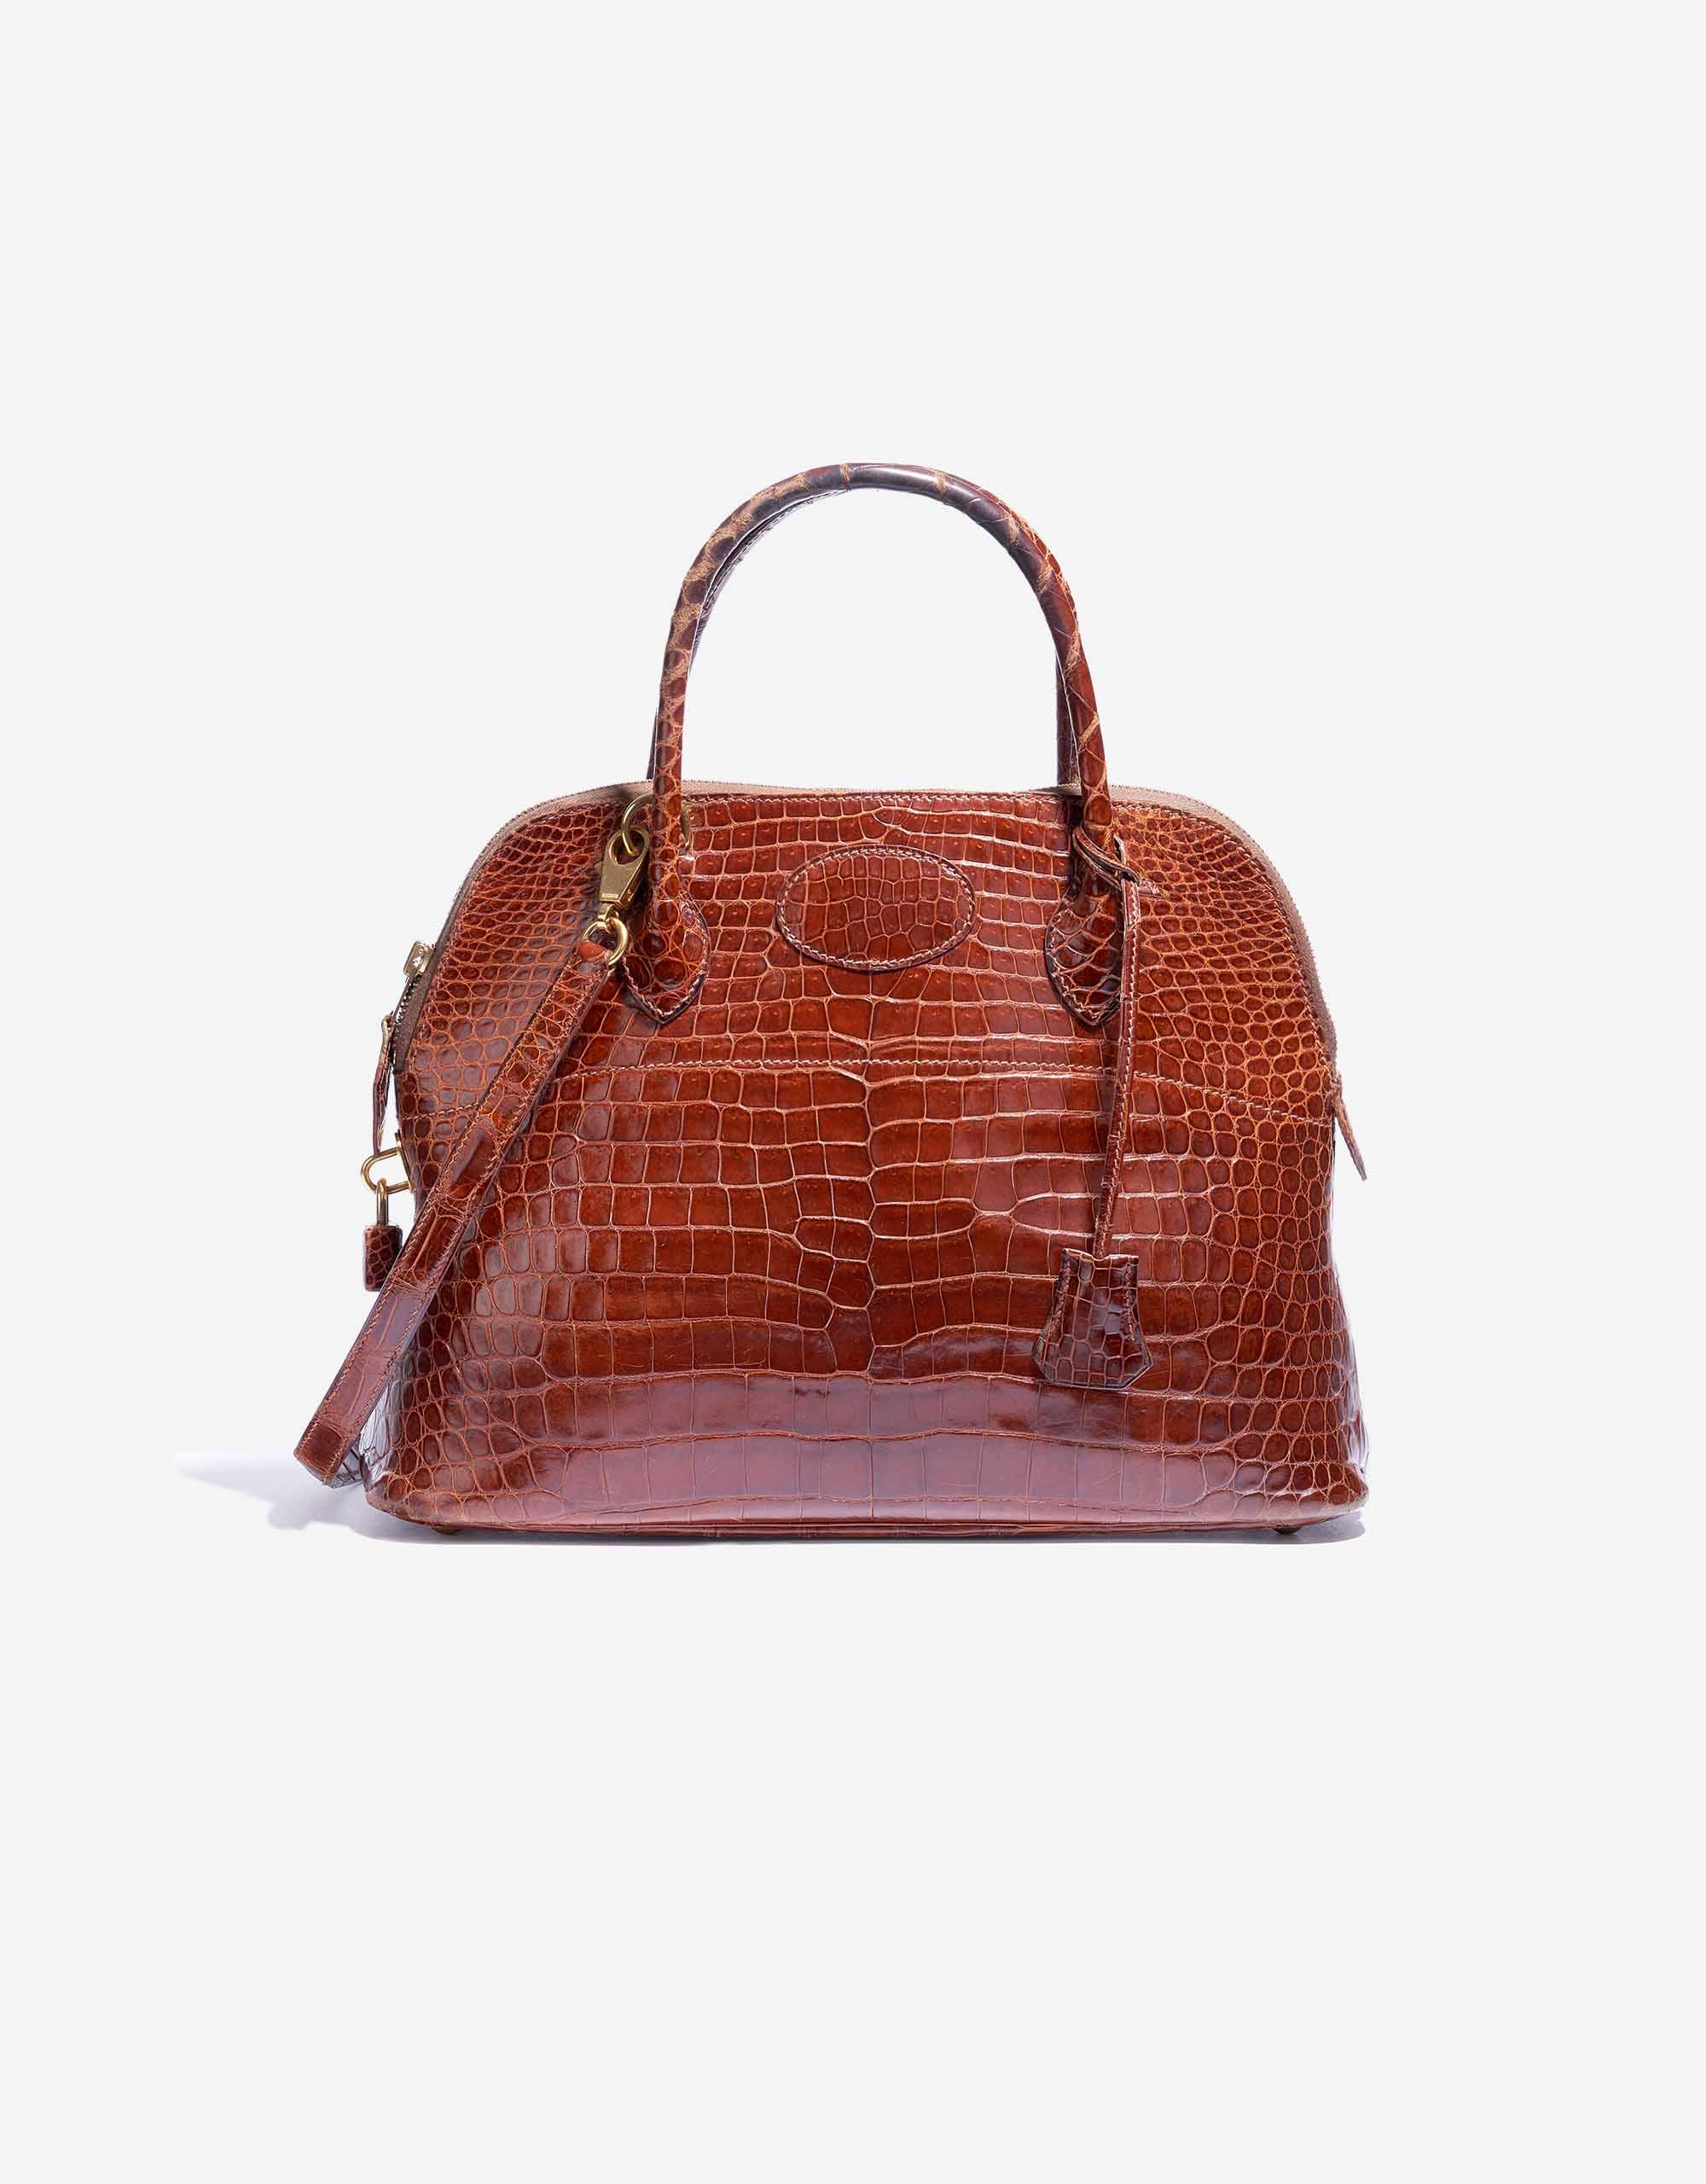 Hermès Bolide 31 Porosus Crocodile Brown | SACLÀB